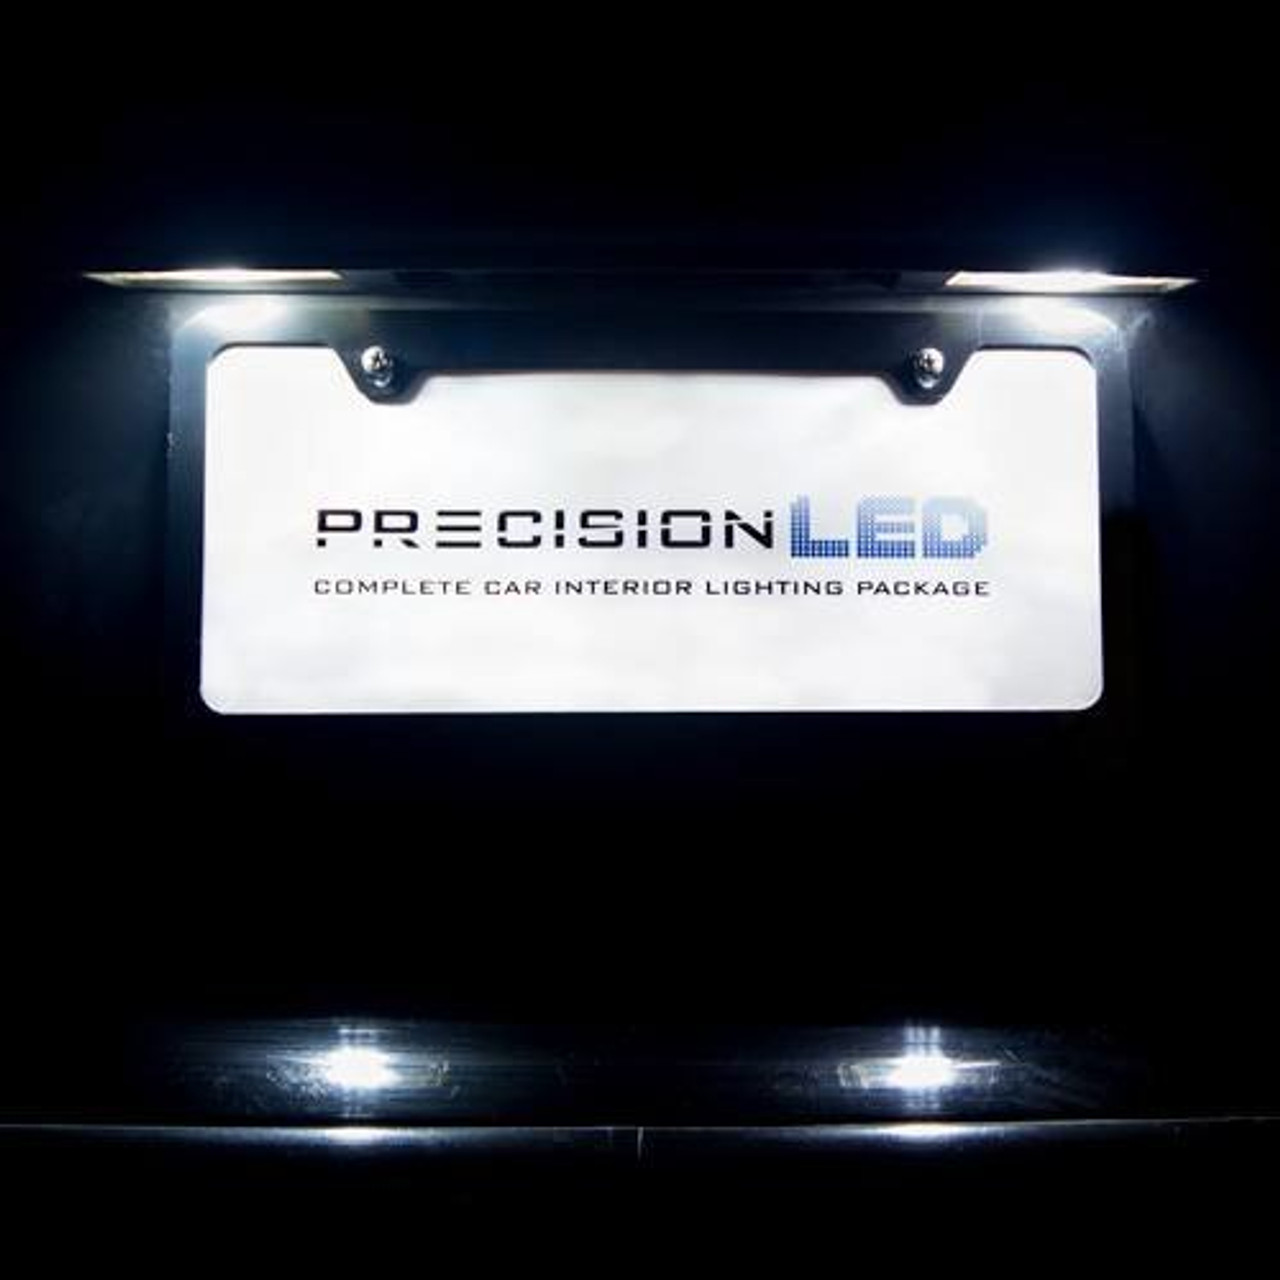 BMW M3 E46 LED License Plate Lights (2001-2006)